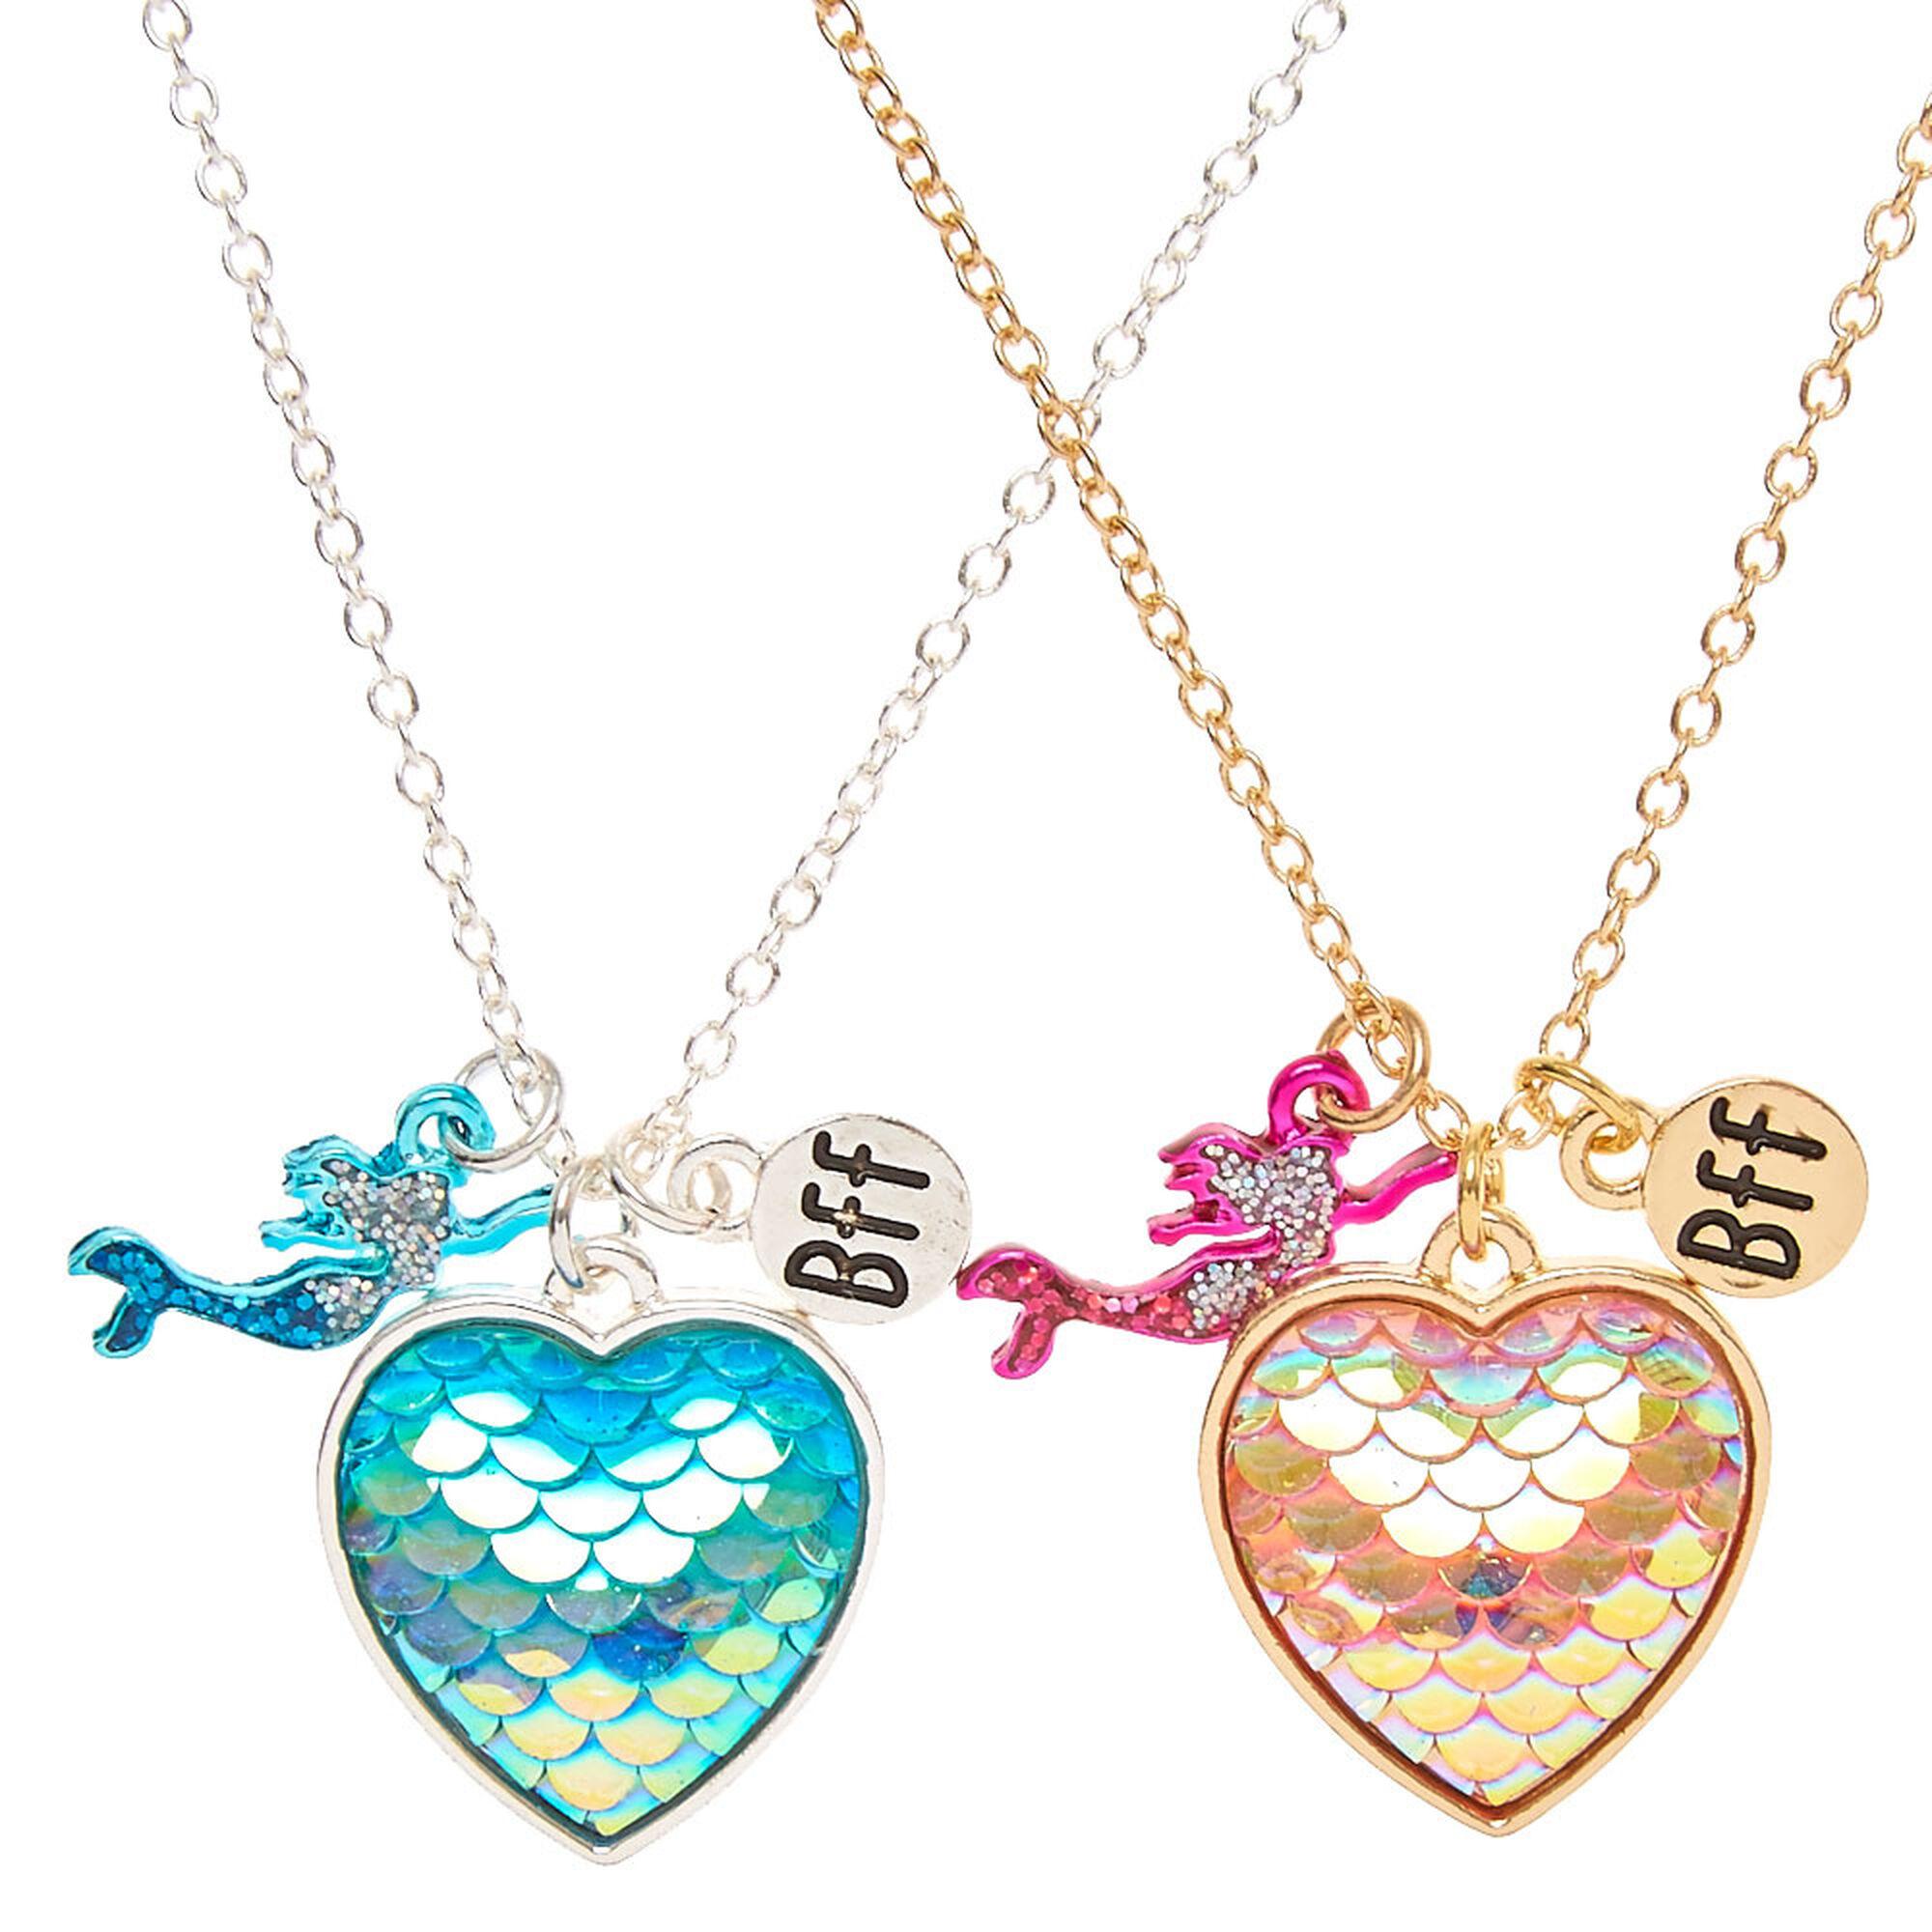 Best friends mermaid scales heart pendant necklaces claires us best friends mermaid scales heart pendant necklaces mozeypictures Choice Image